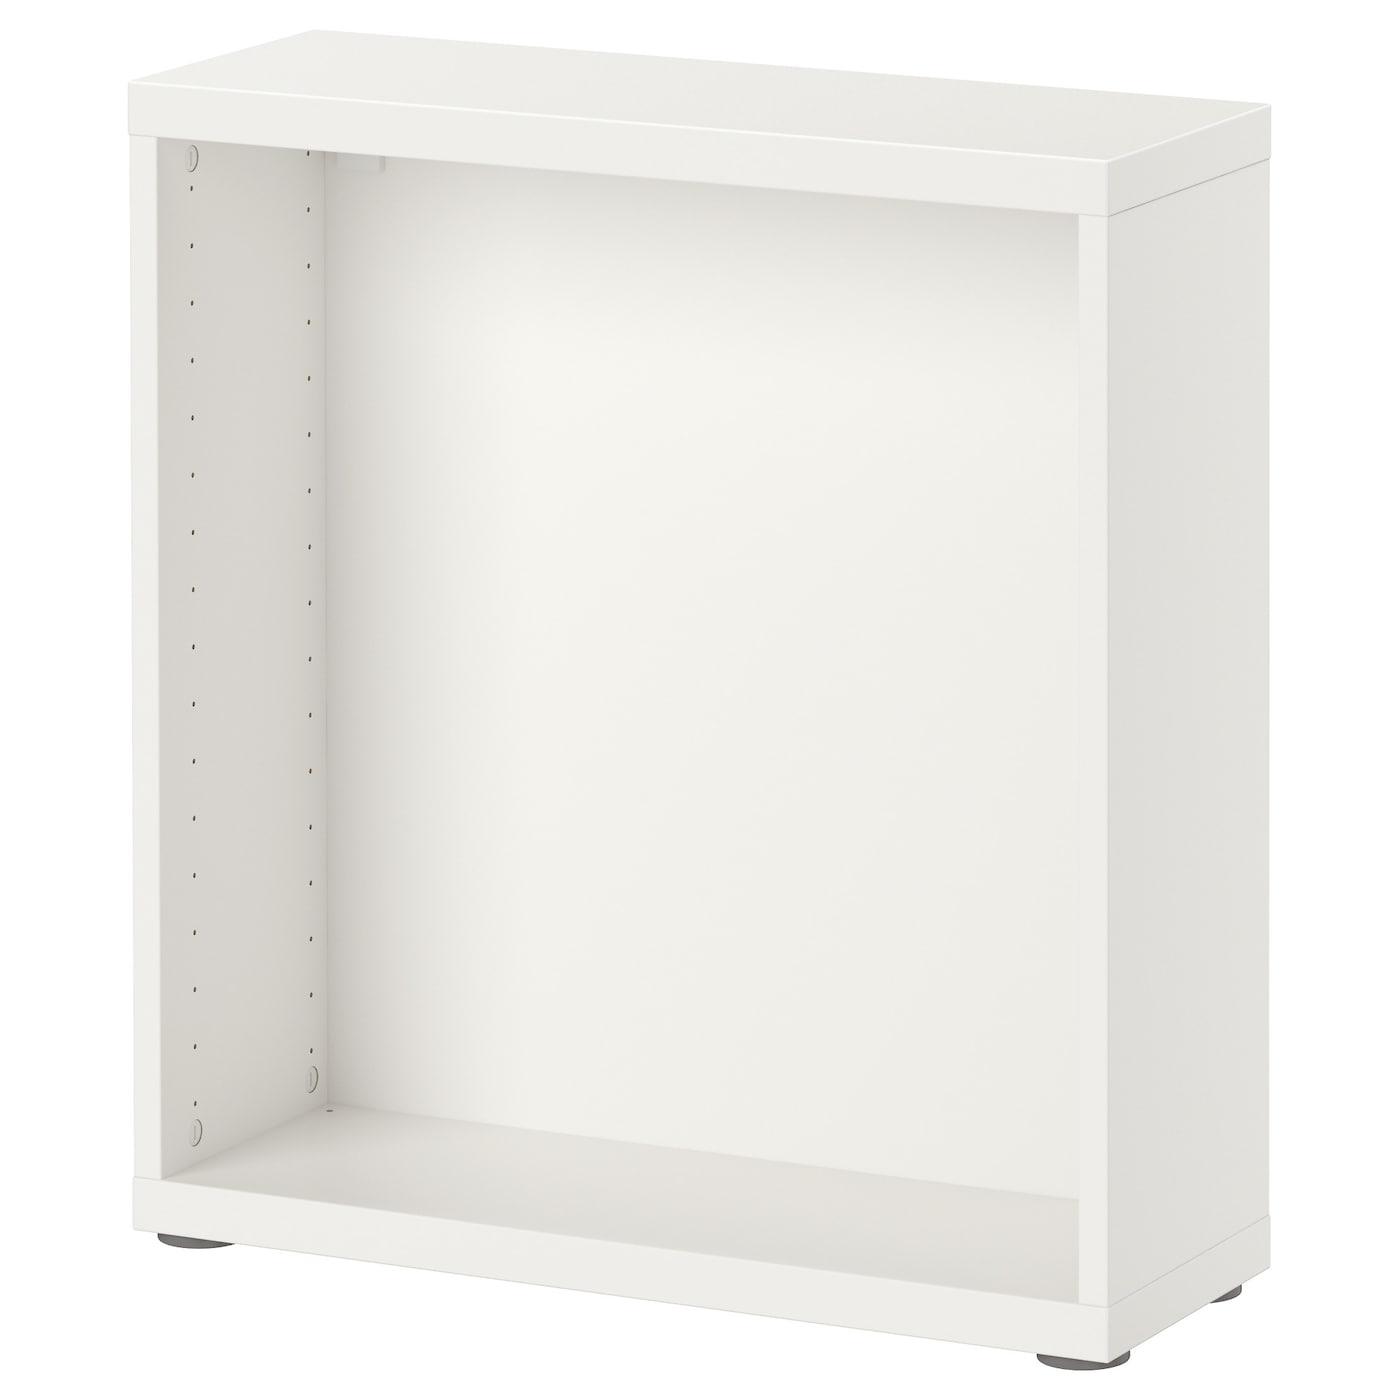 Besta Frame White 23 5 8x7 7 8x25 1 4 Ikea